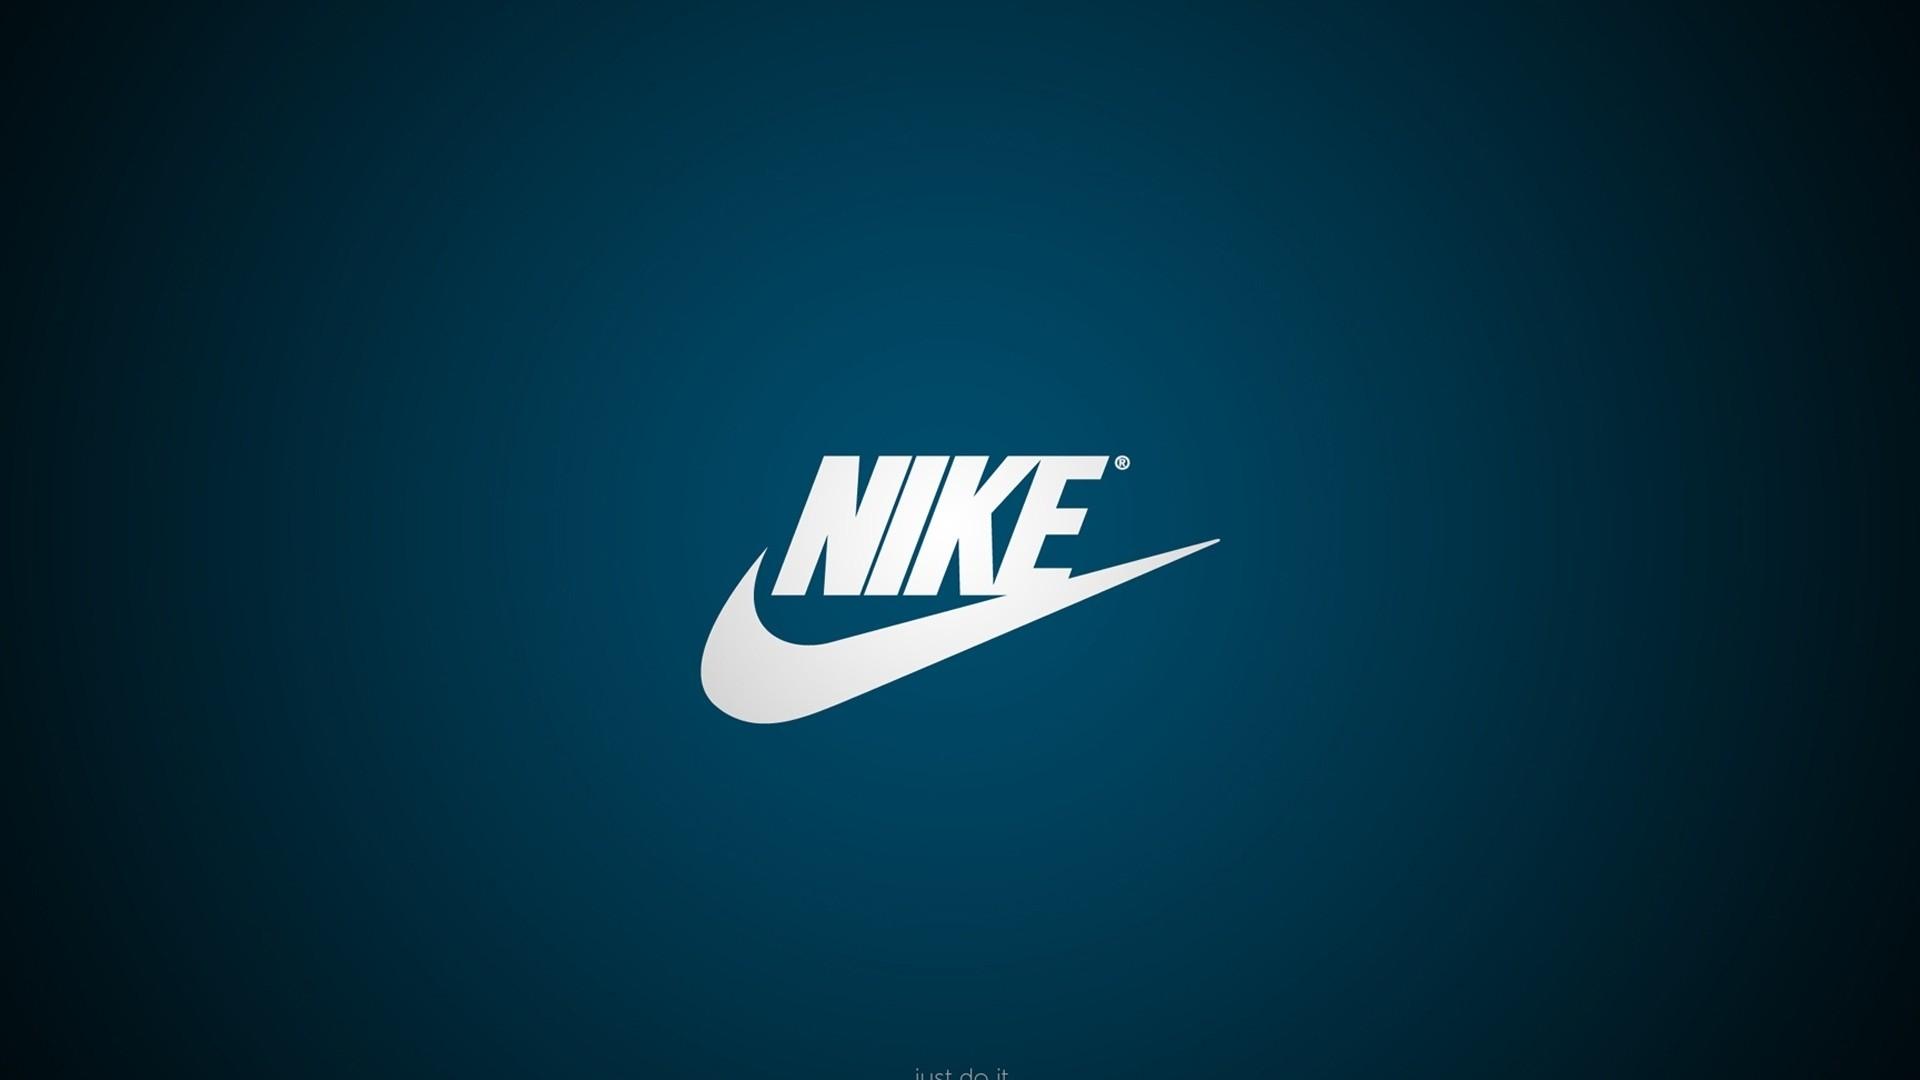 Nike Logo Wallpaper HD 2018 (64+ Images